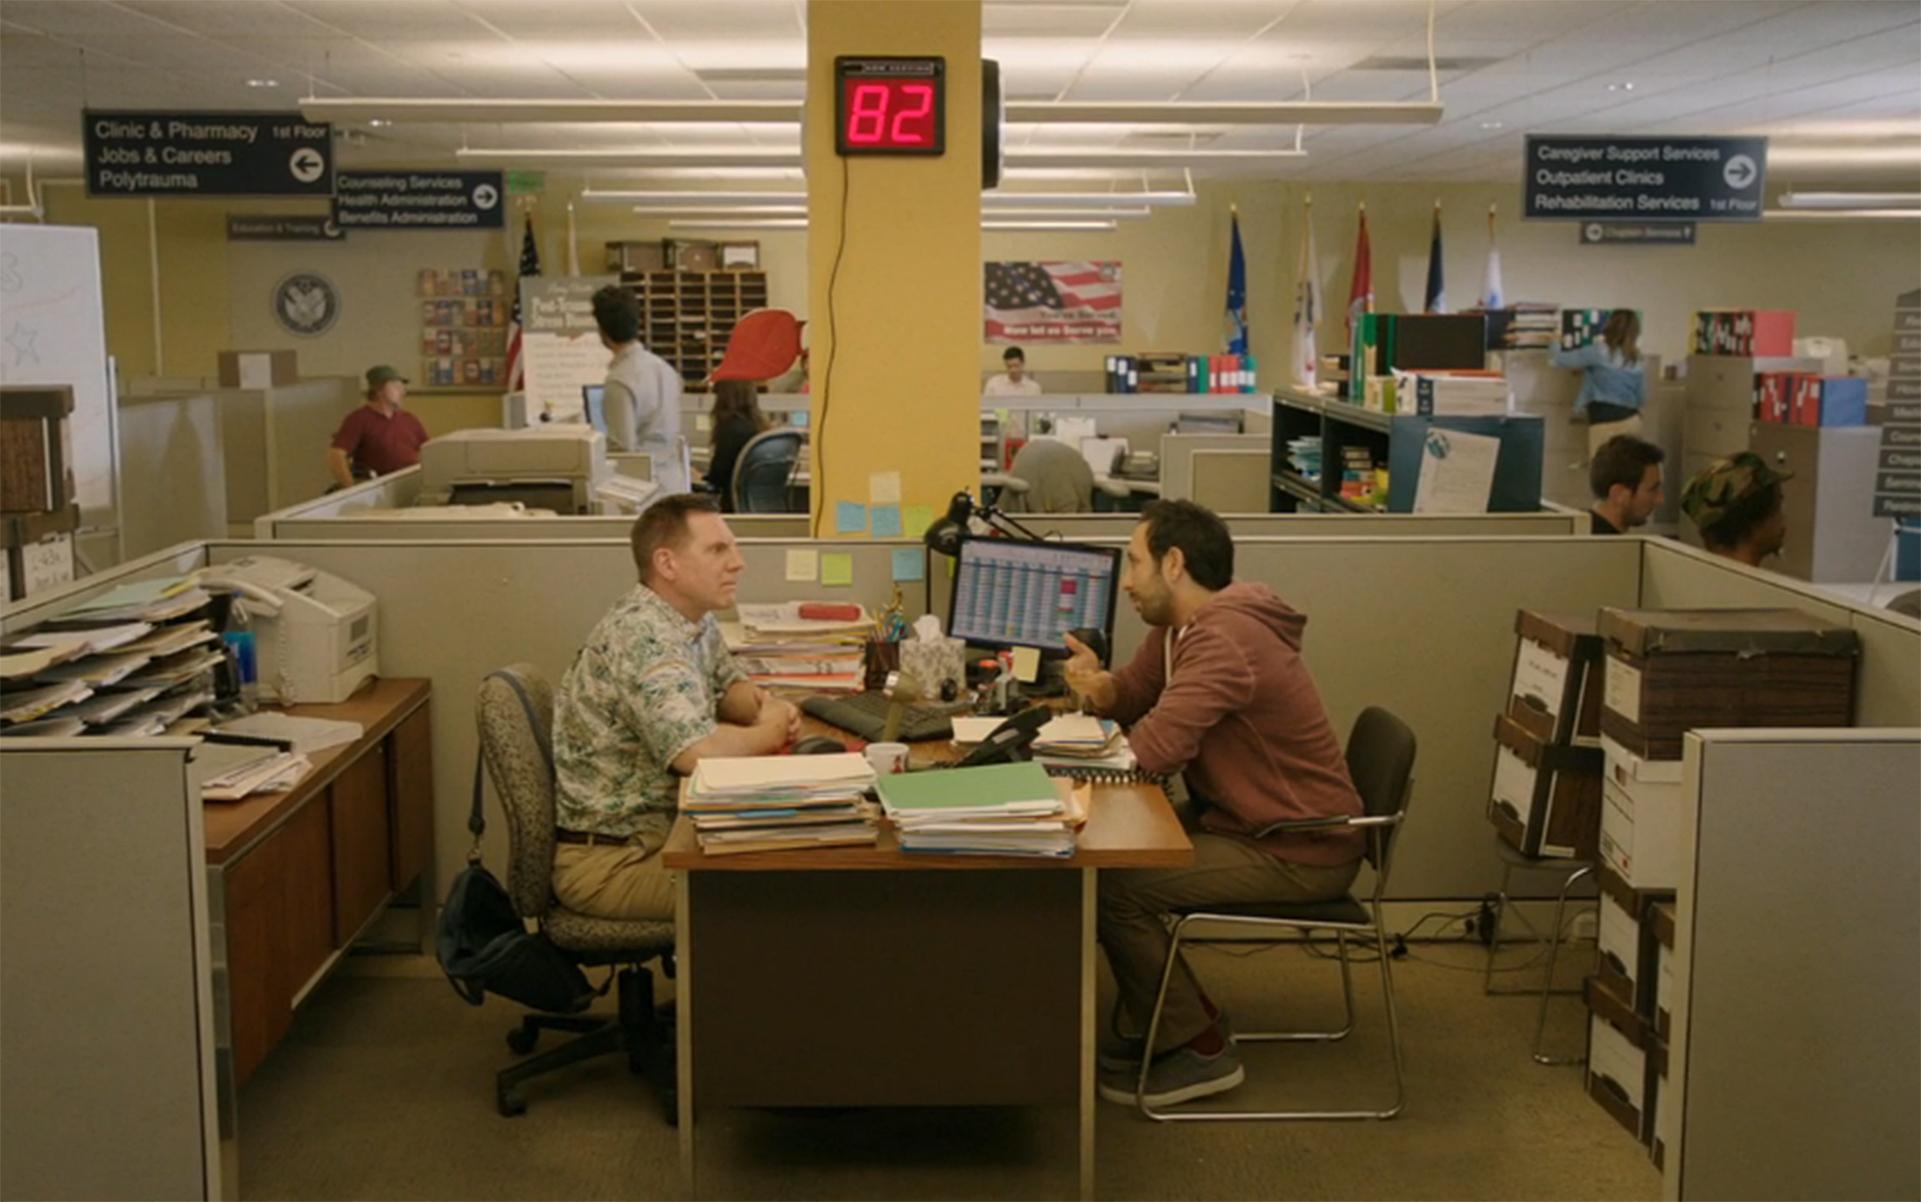 'You're the Worst' season 3: Edgar's VA meeting